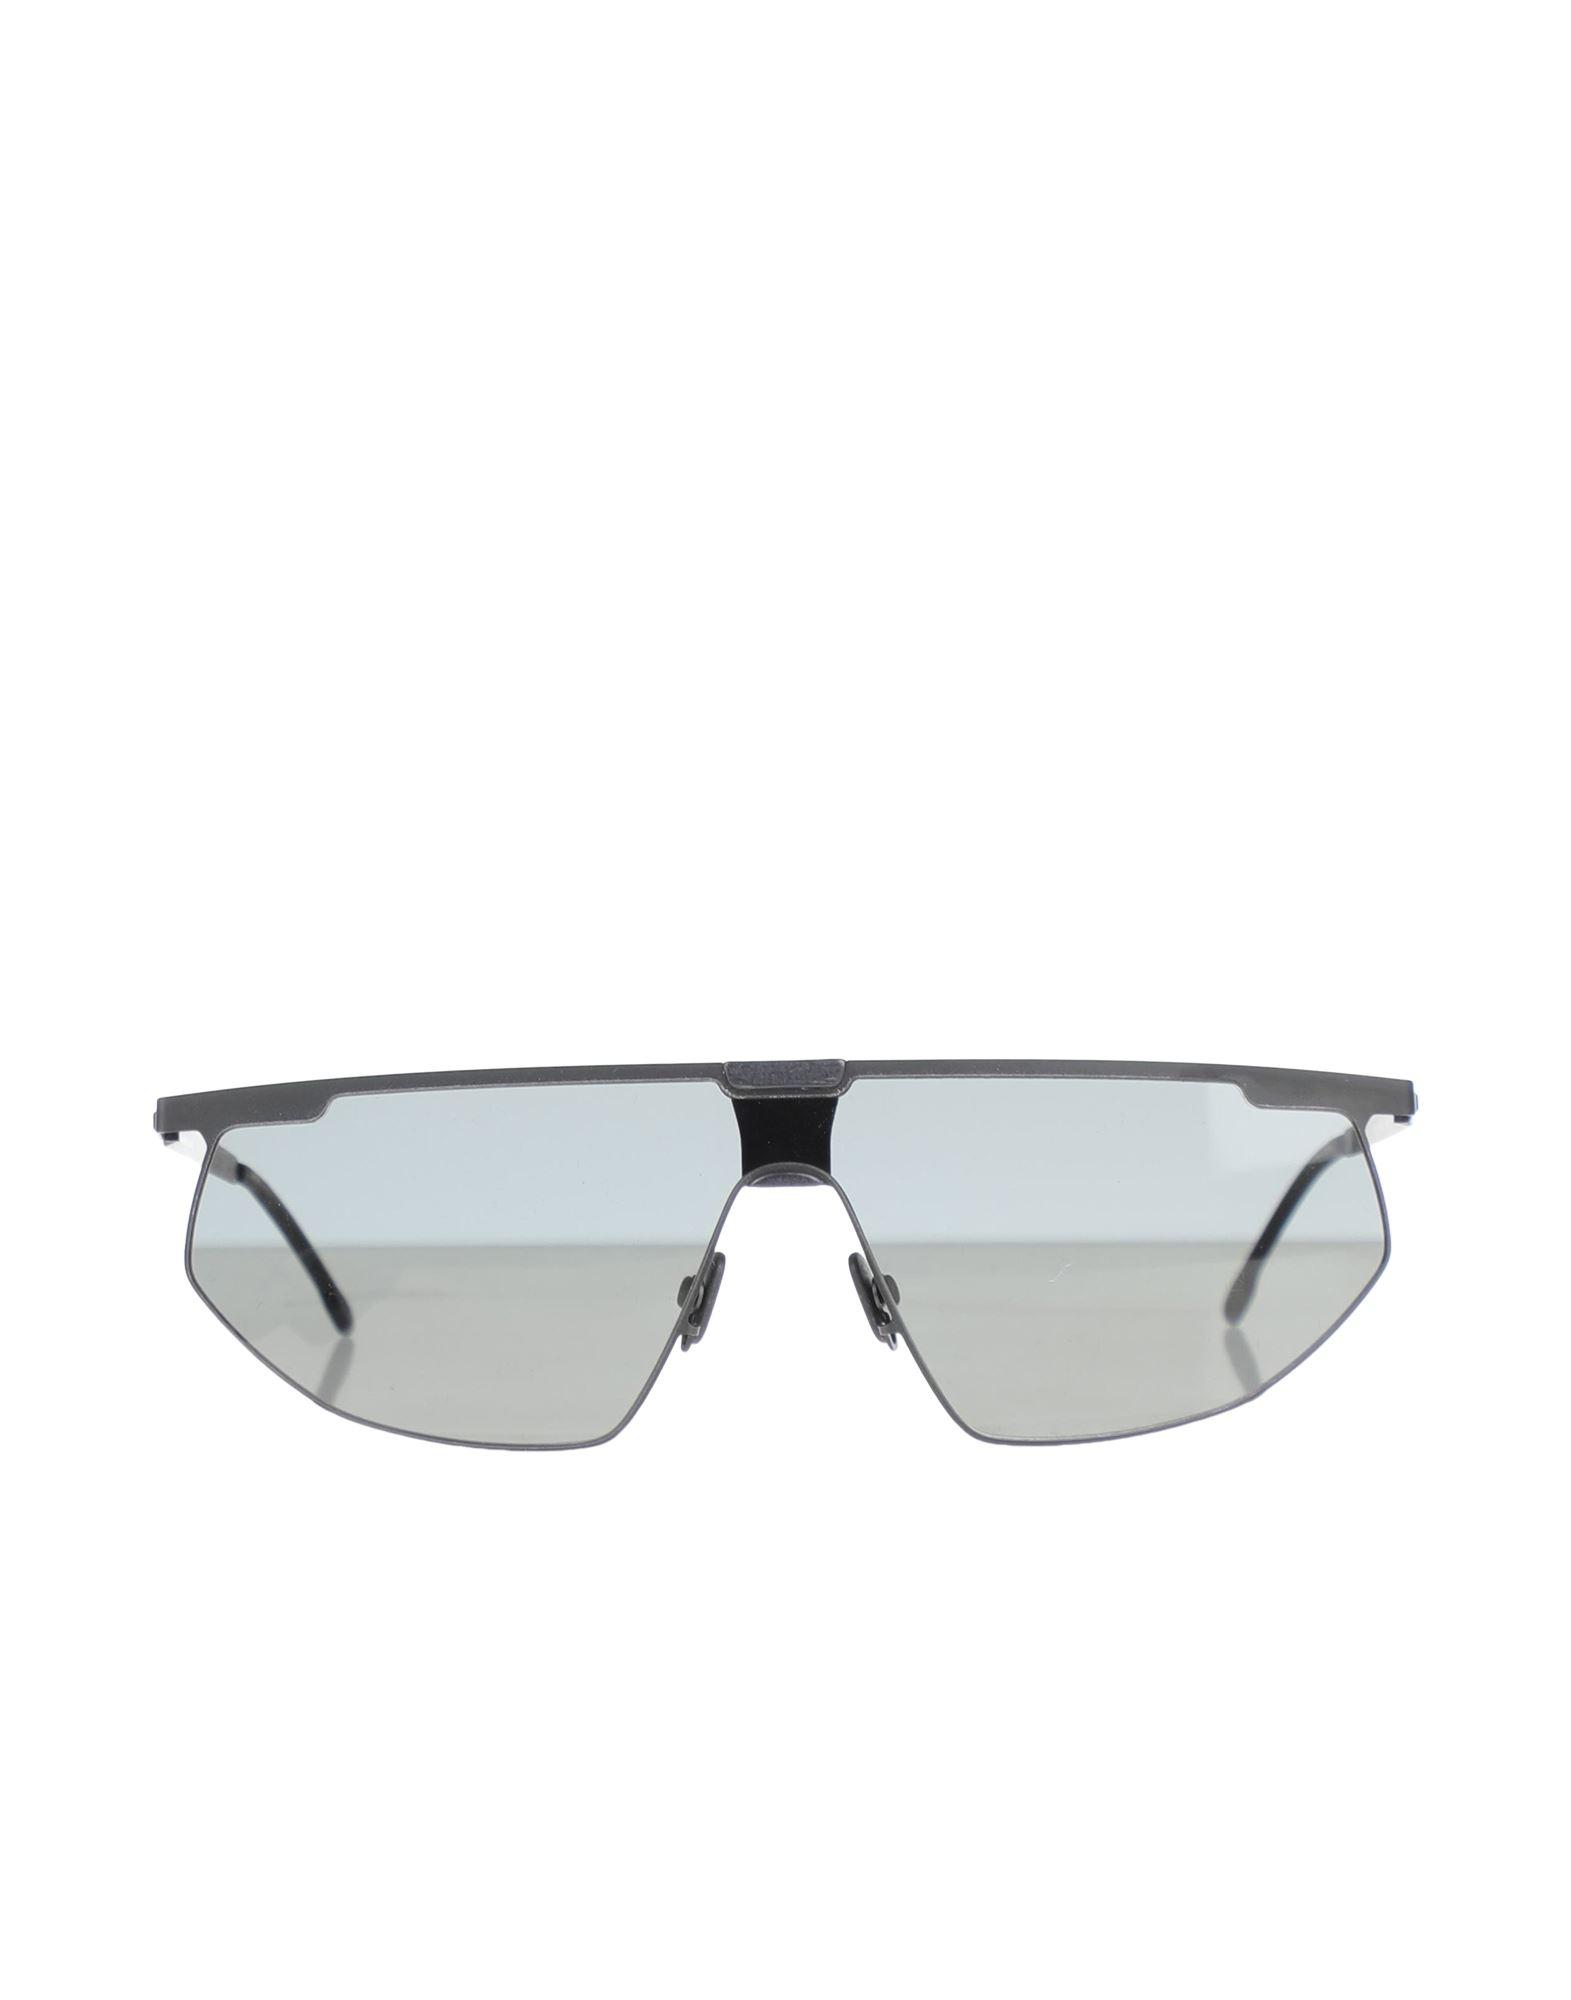 MYKITA & BERNHARD WILLHELM Солнечные очки